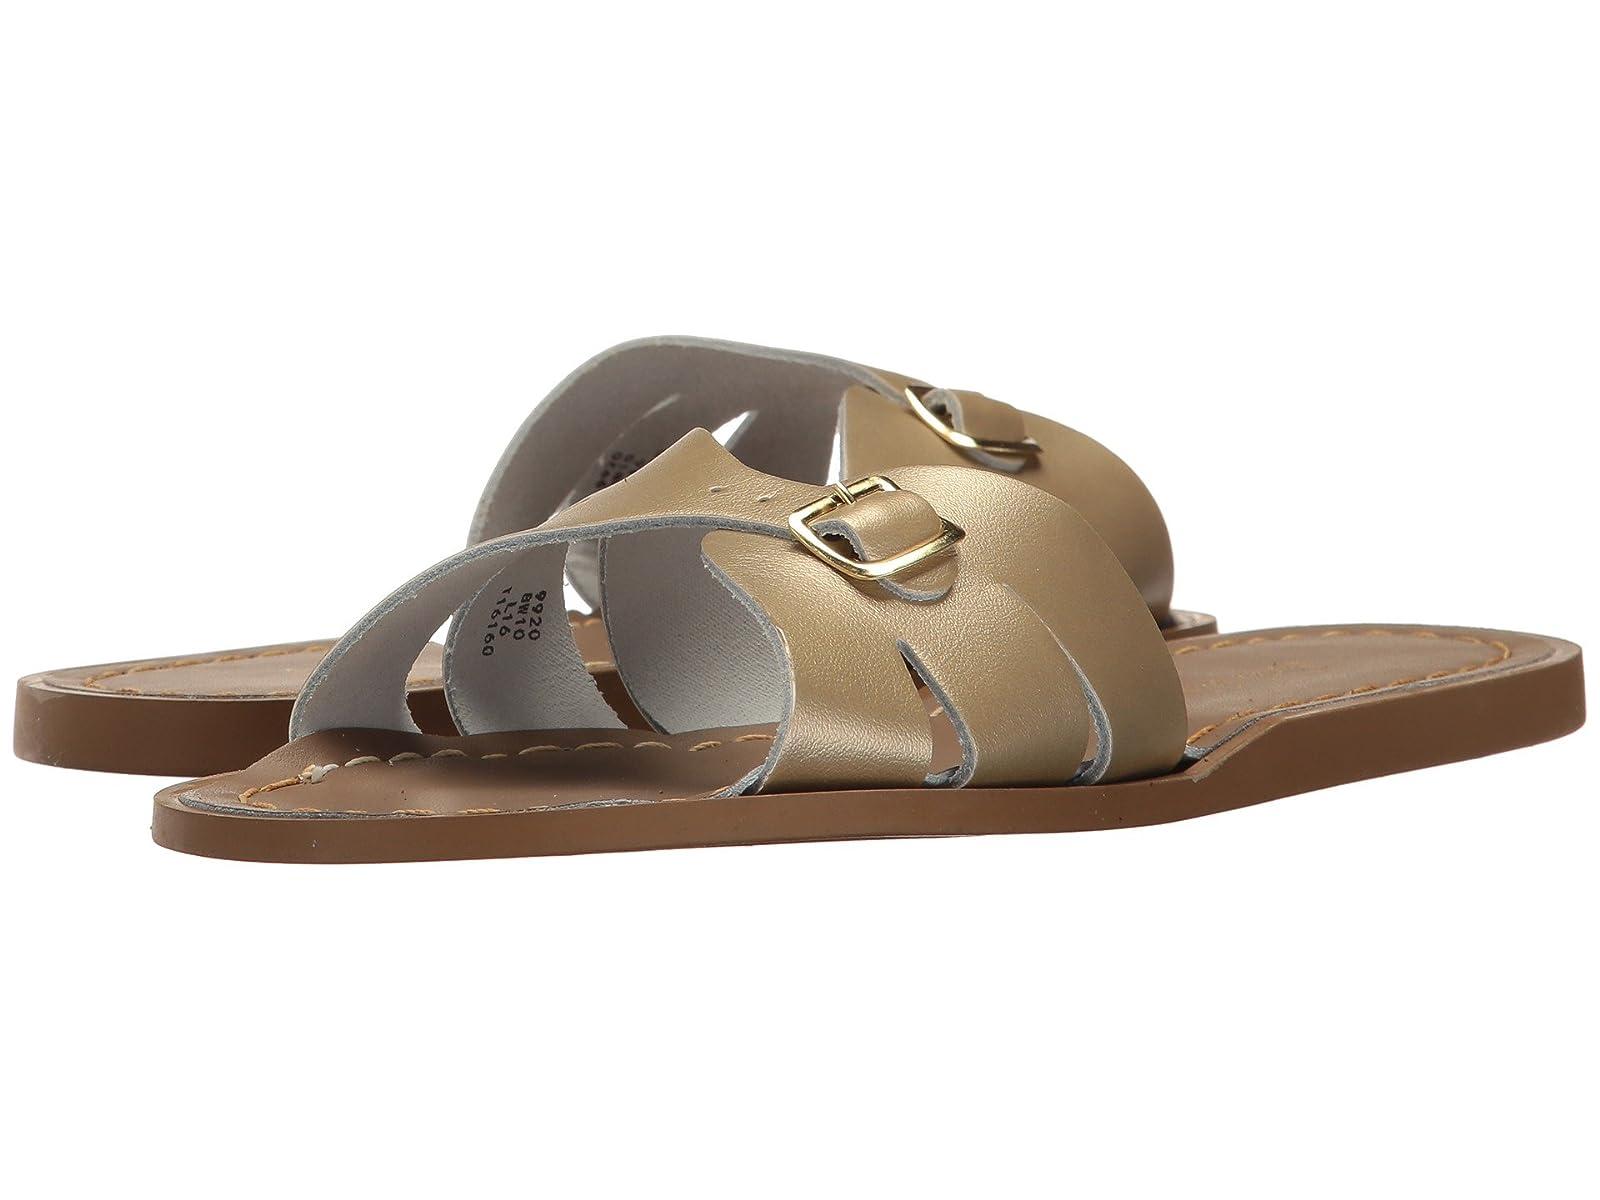 Salt Water Sandal by Hoy Shoes Classic Slide (Big Kid/Adult)Atmospheric grades have affordable shoes